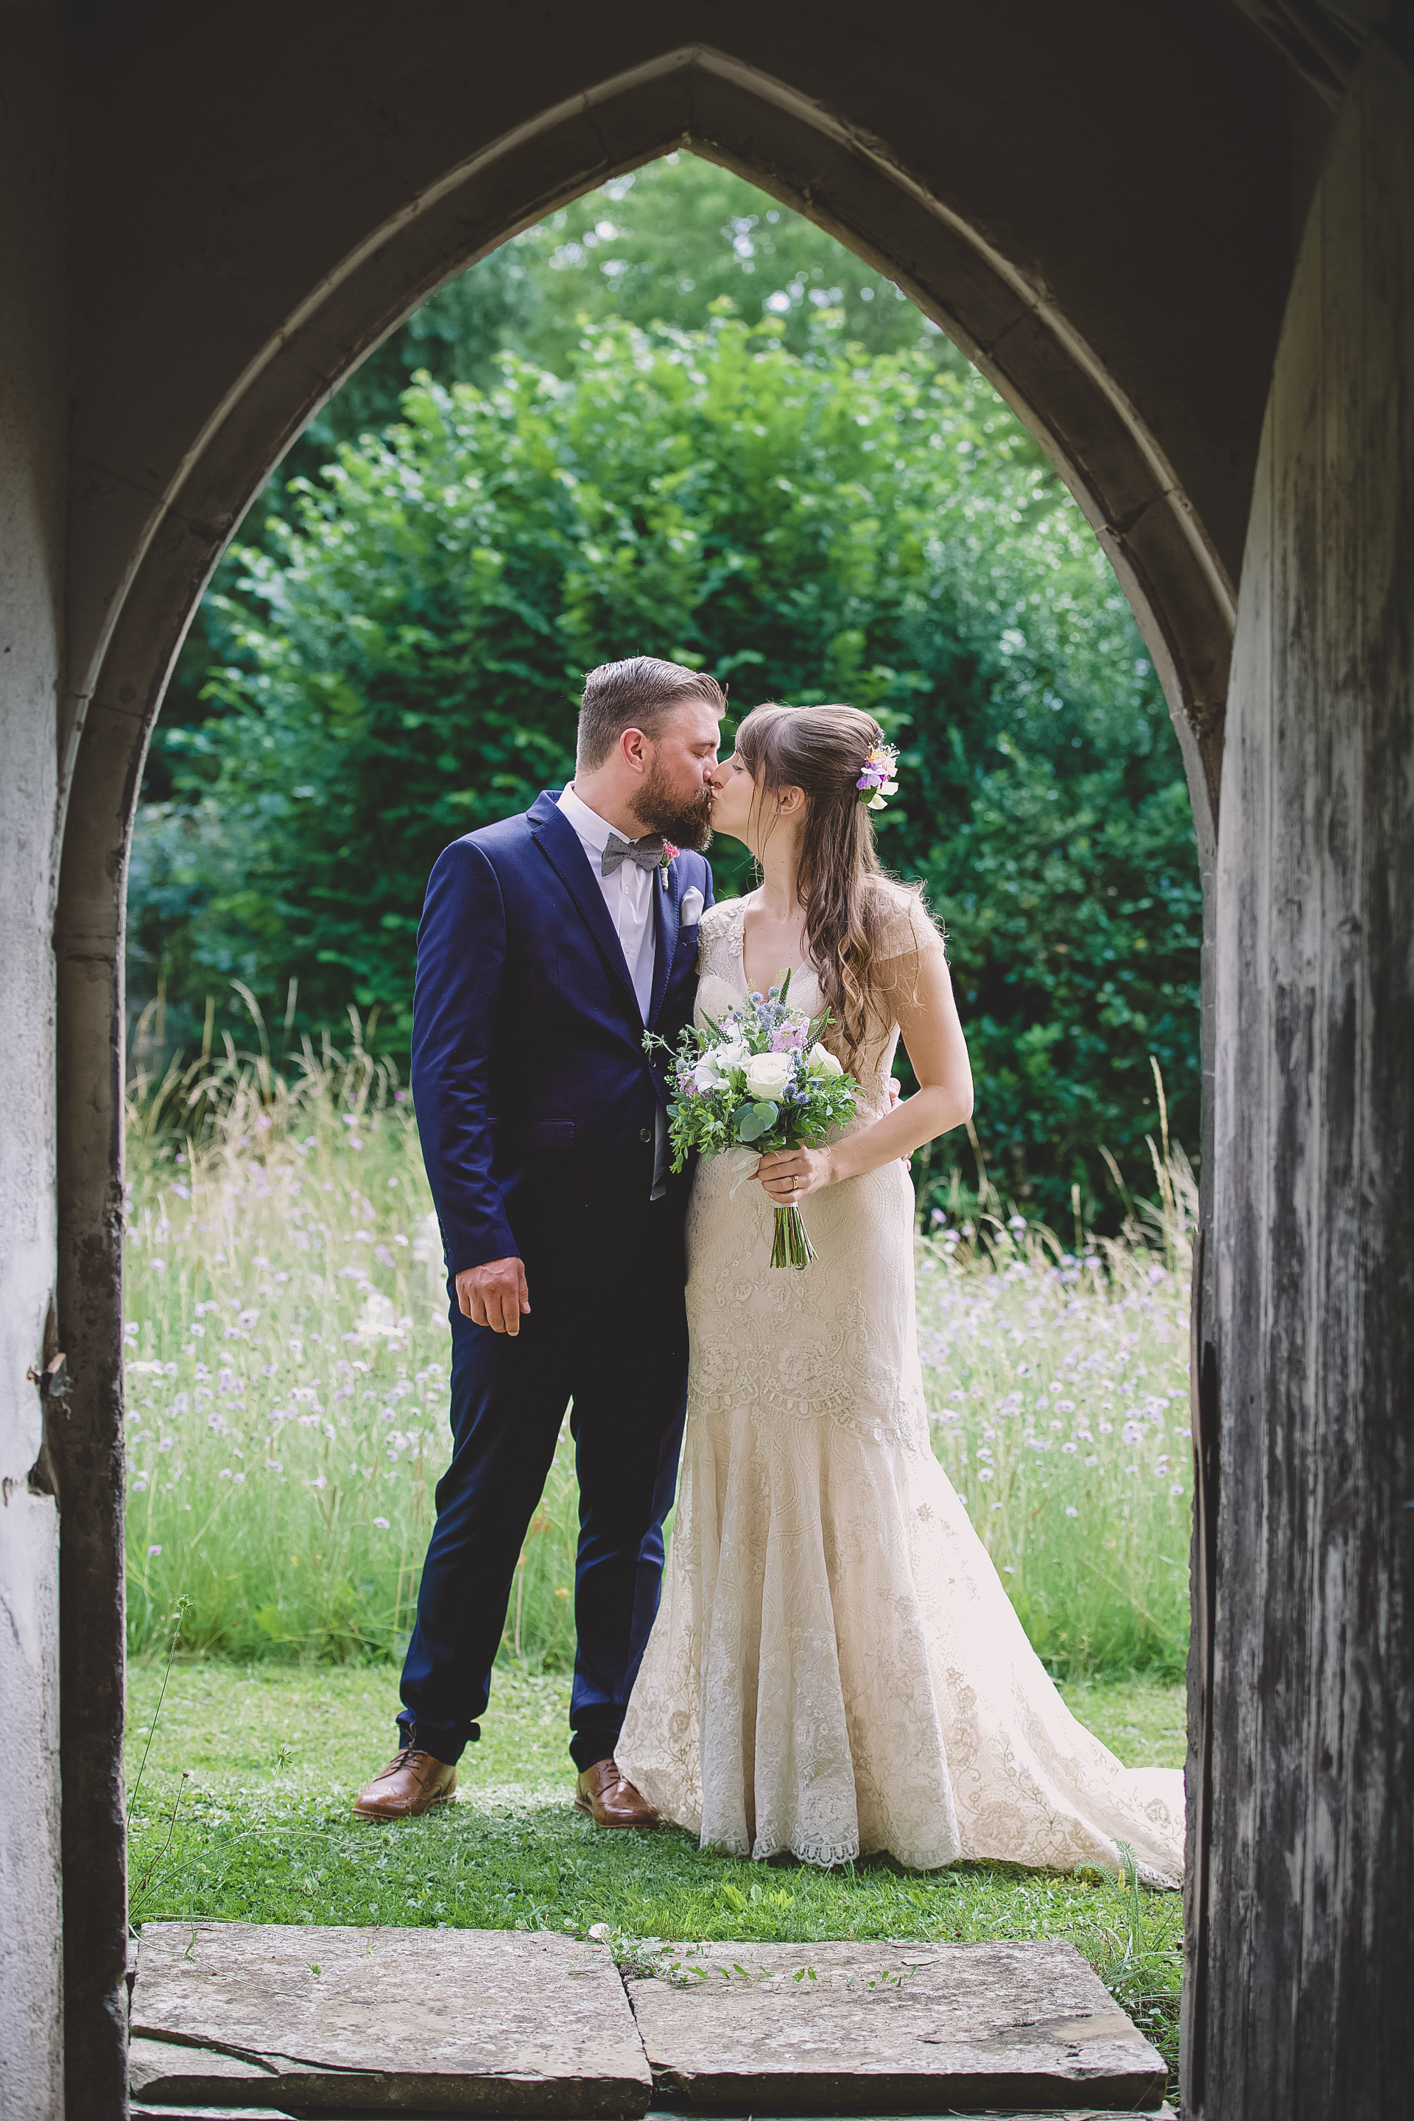 lilac_thyme-wedding_flowers_white_kiss.JPG